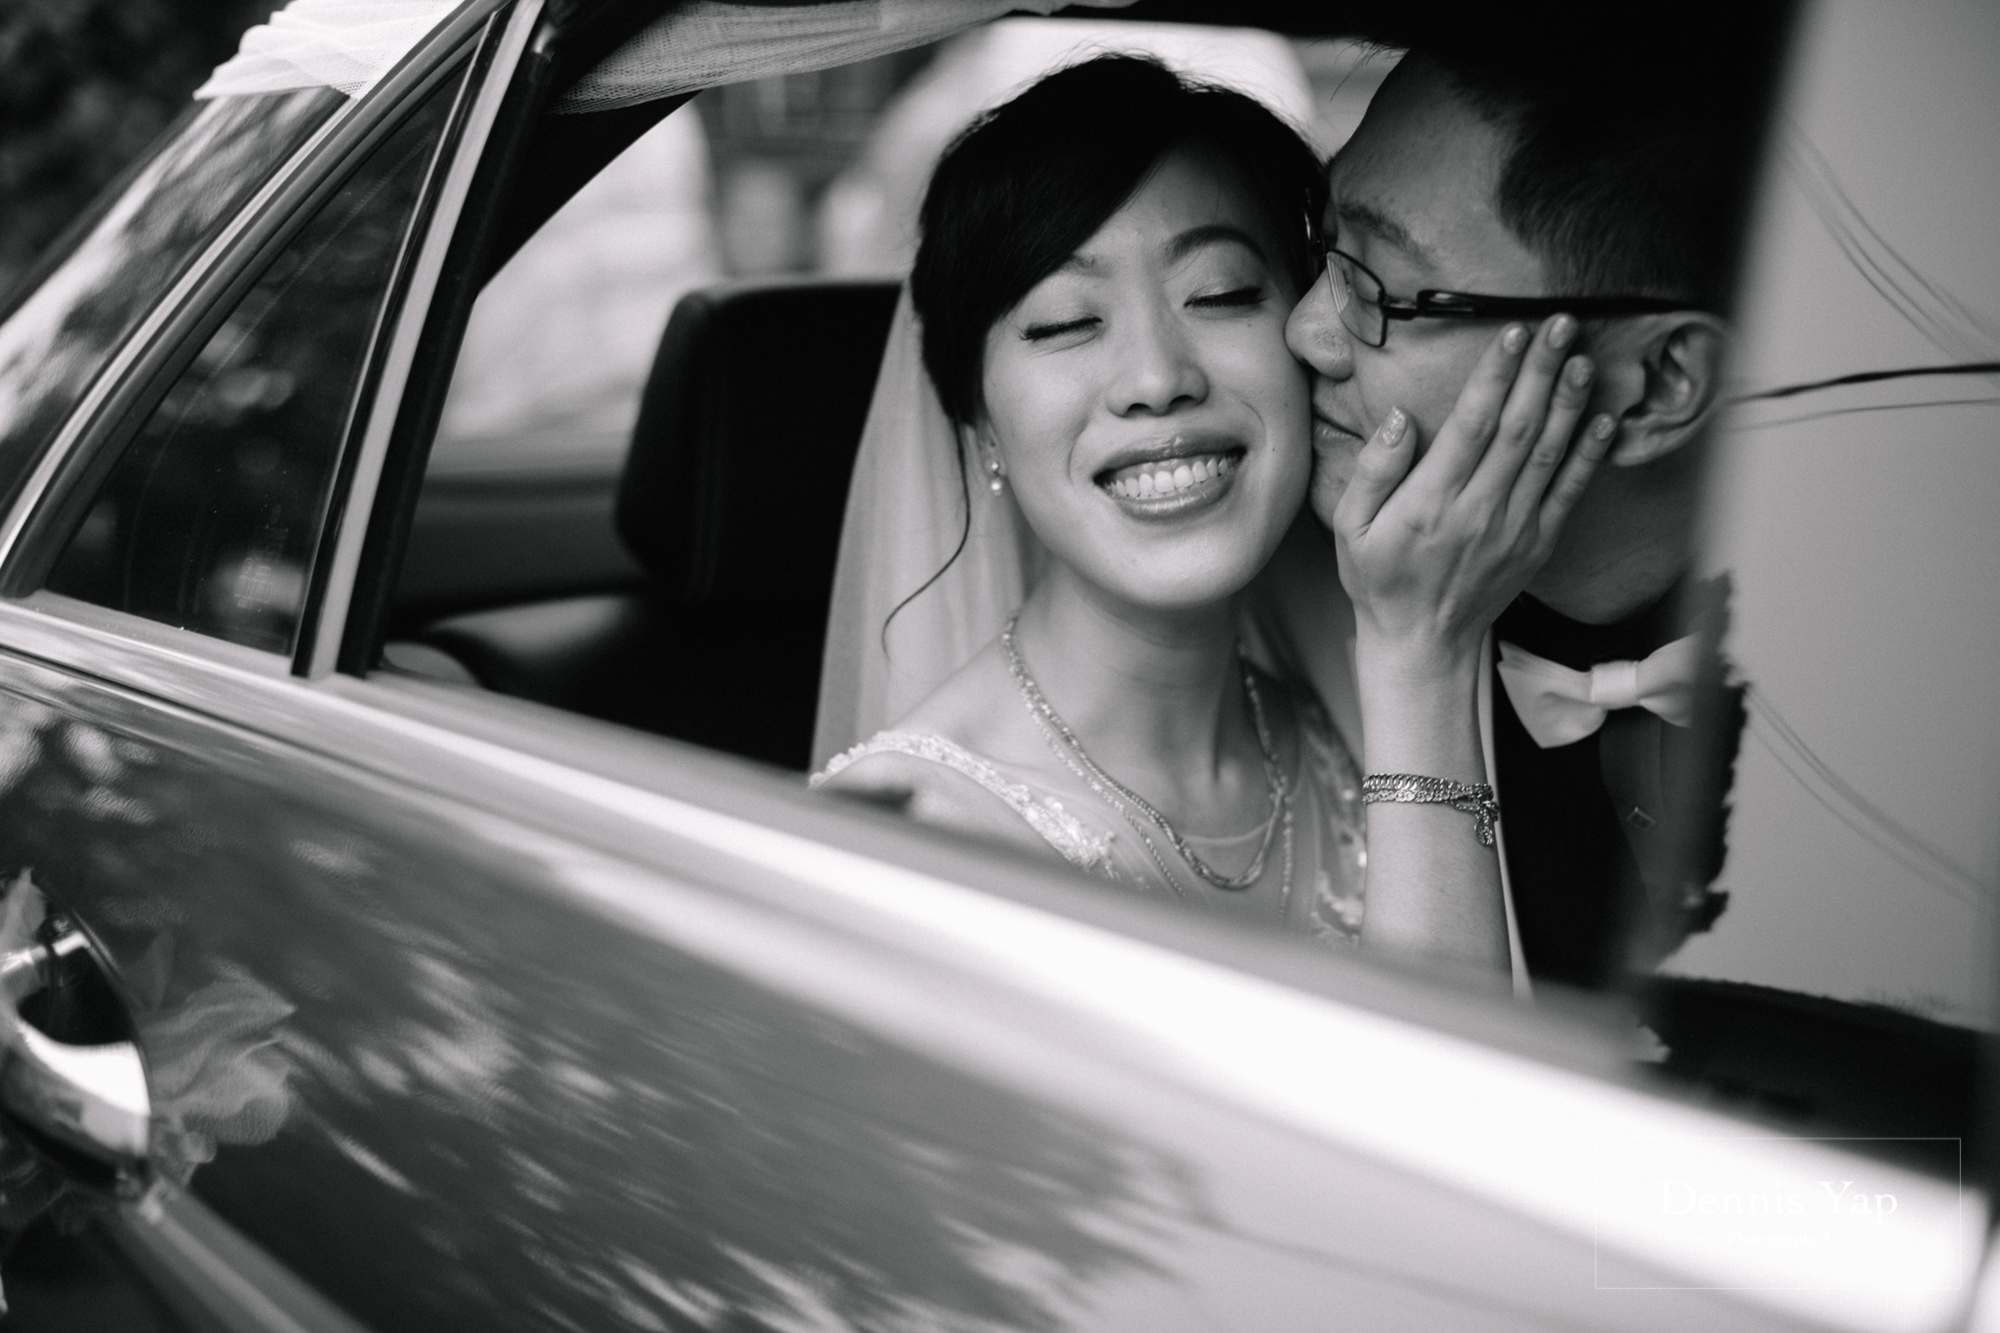 alex shir ley wedding day gate crash subang jaya usj dennis yap photography moments-14.jpg